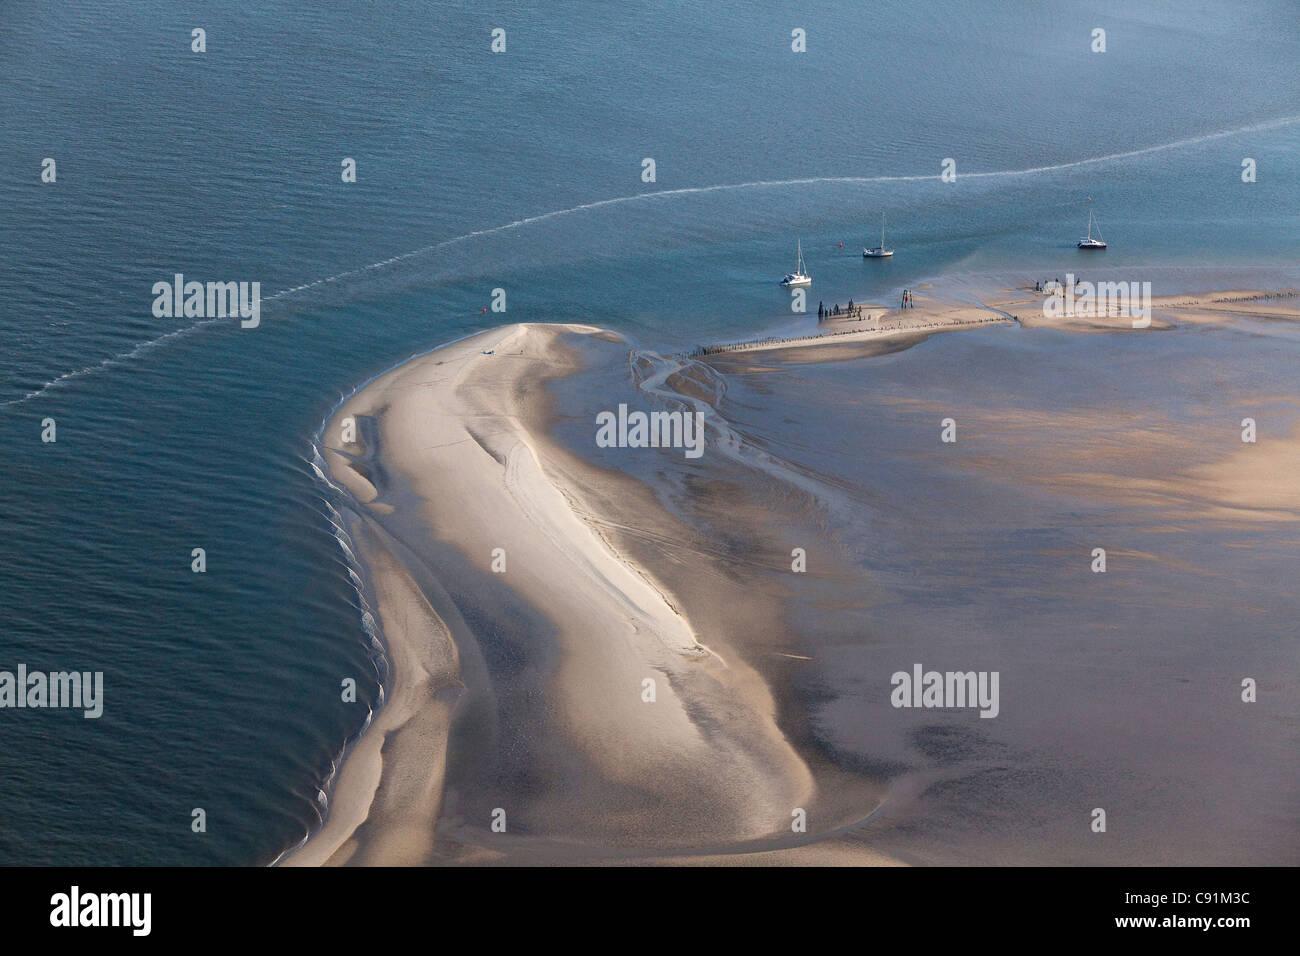 Aerial of yachts anchored on a sandbank, Wadden Sea, Lower Saxony, Germany - Stock Image